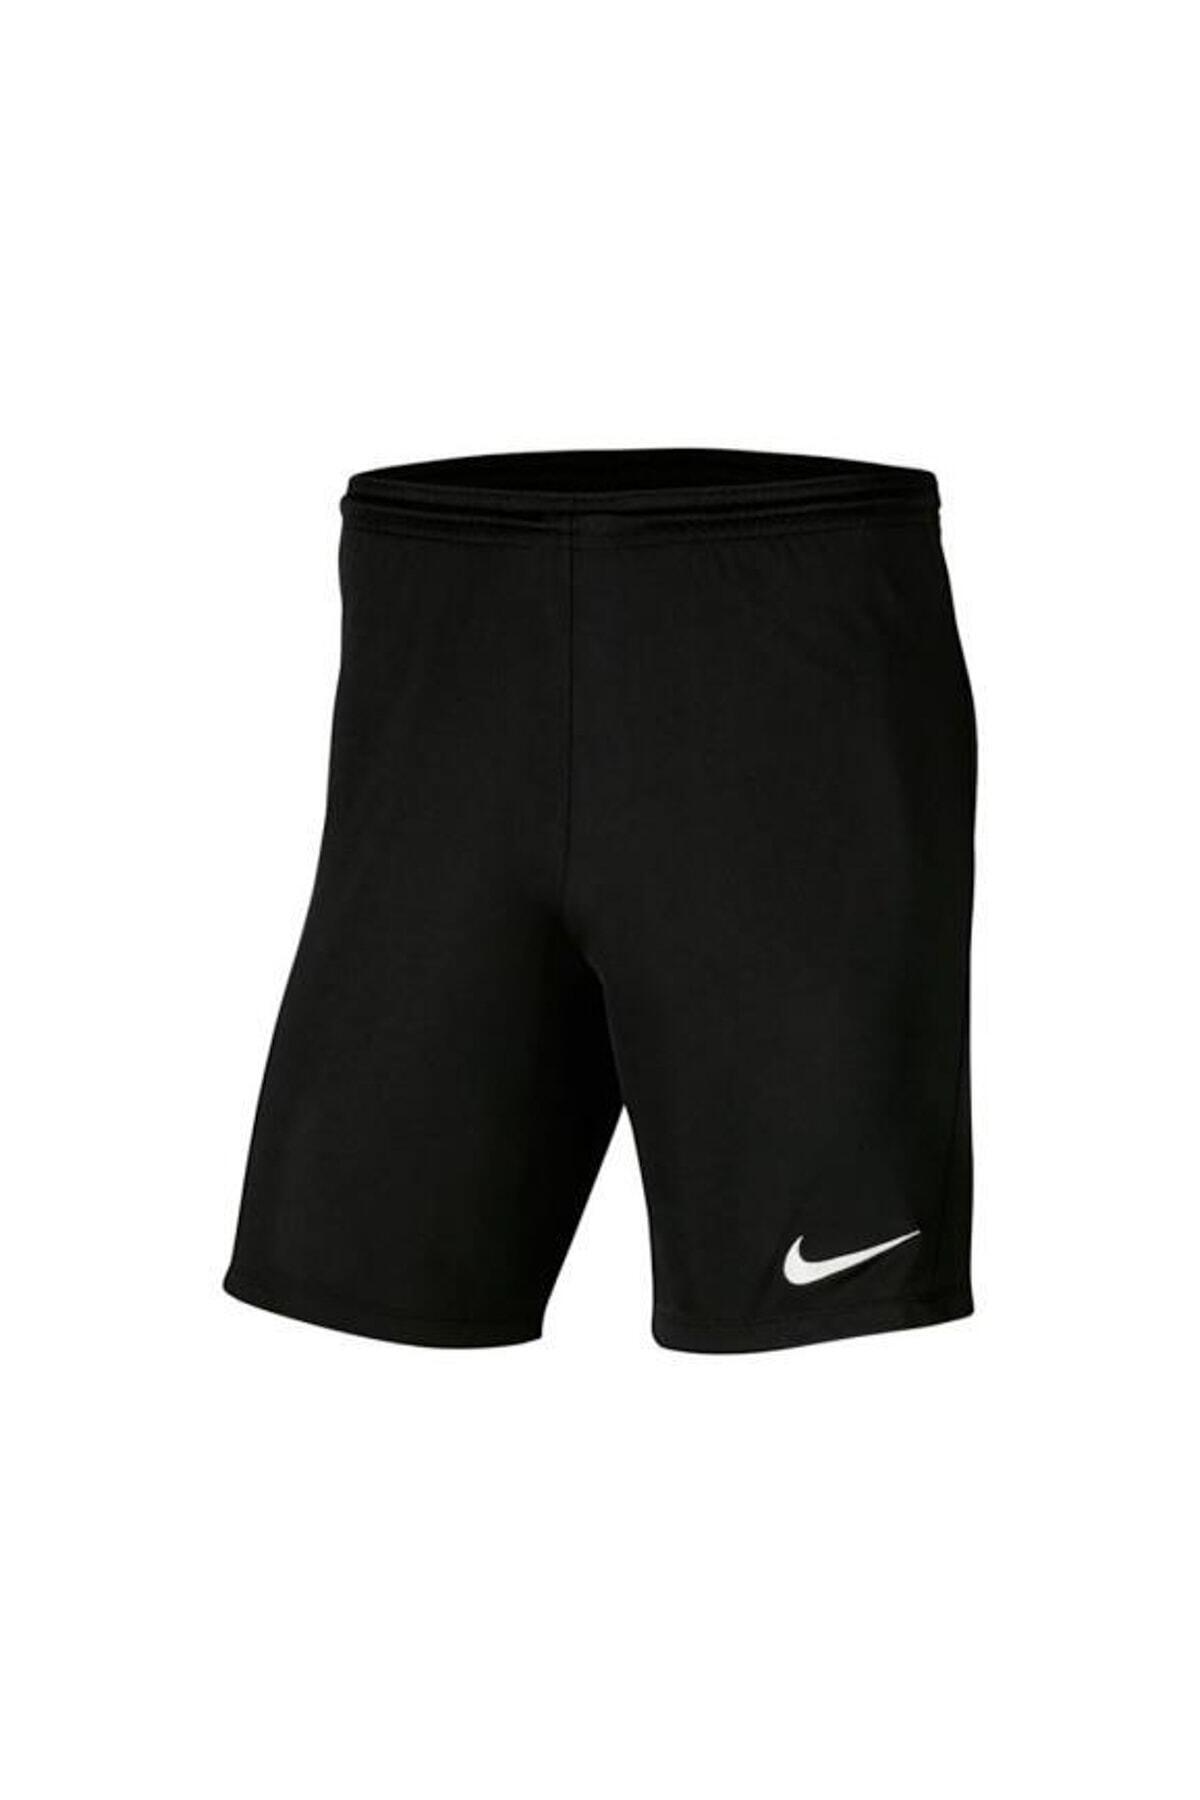 Nike Dry Park III BV6855-010 Erkek Şort 1